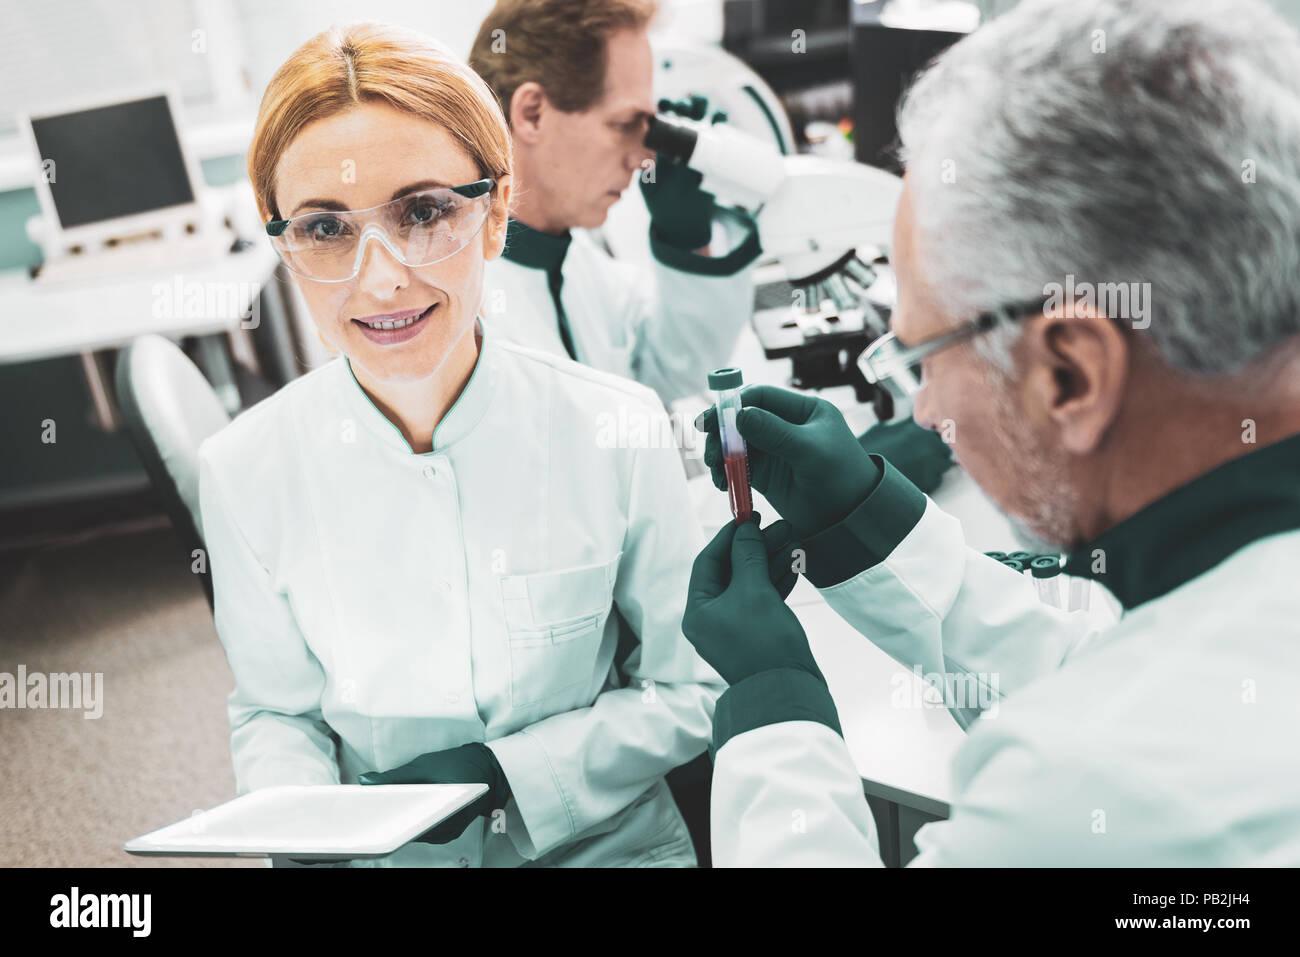 Pleasant chemist worker sitting near her director - Stock Image